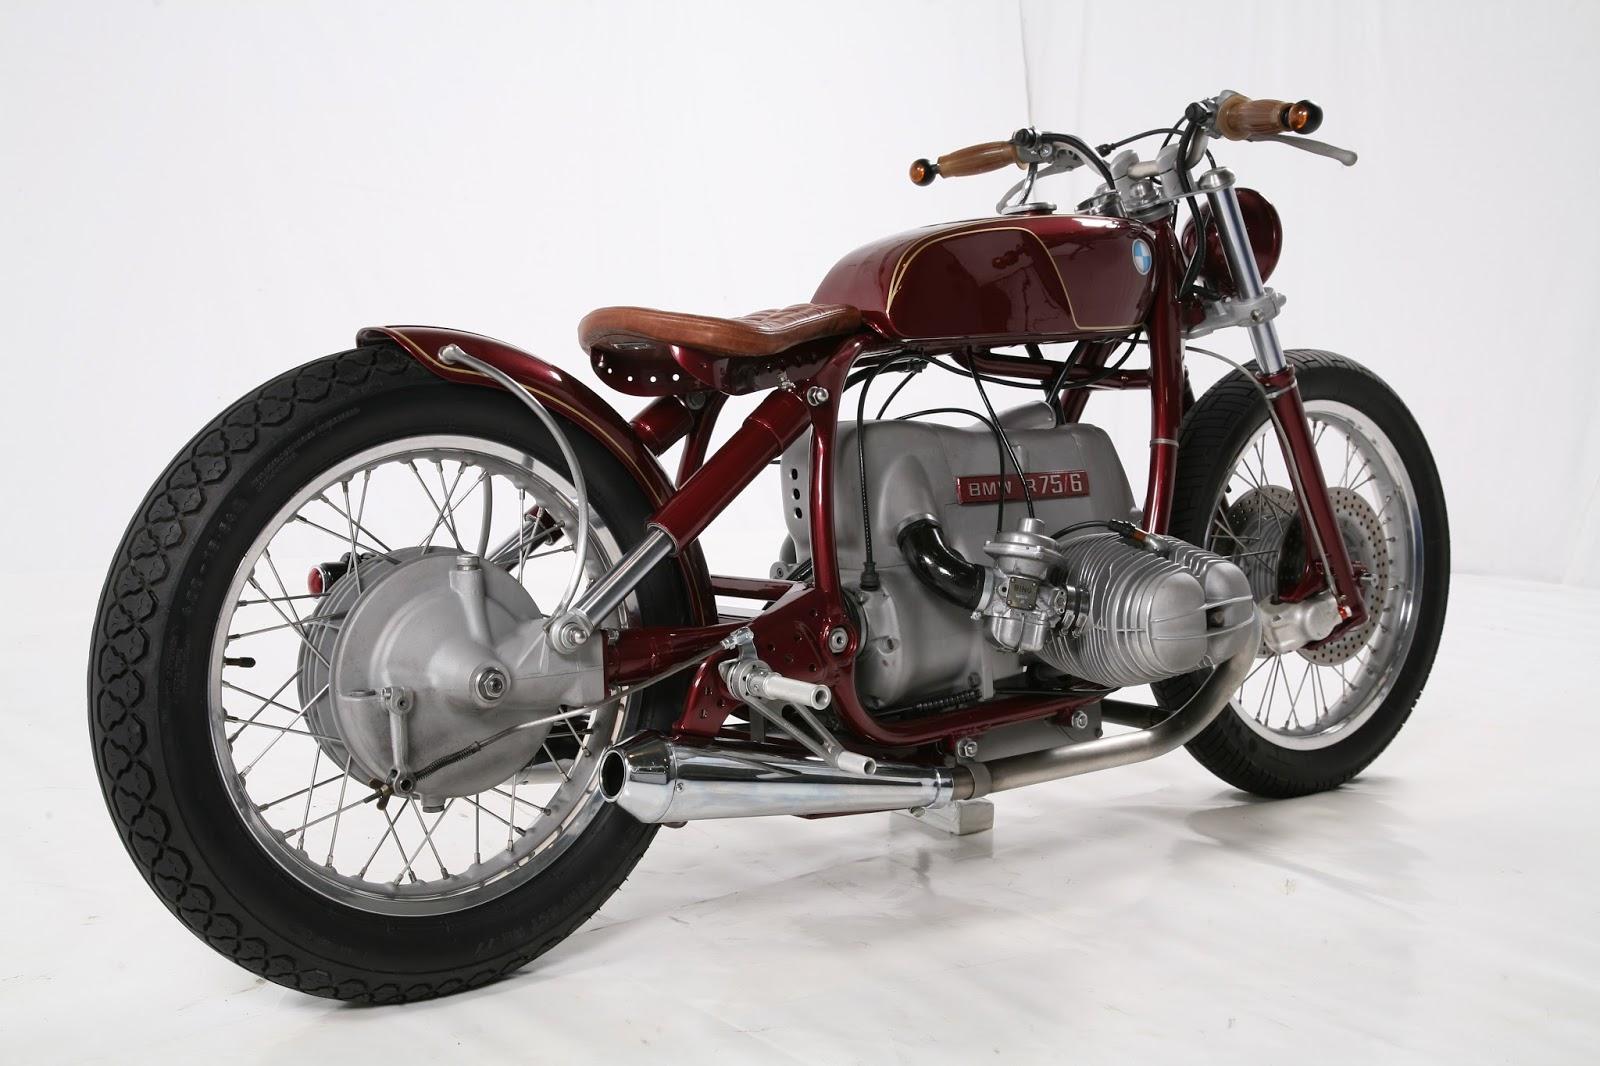 Yamaha Motorcycles Usa >> Kingston Custom BMW R75/6 Bobber Sweetness - autoevolution